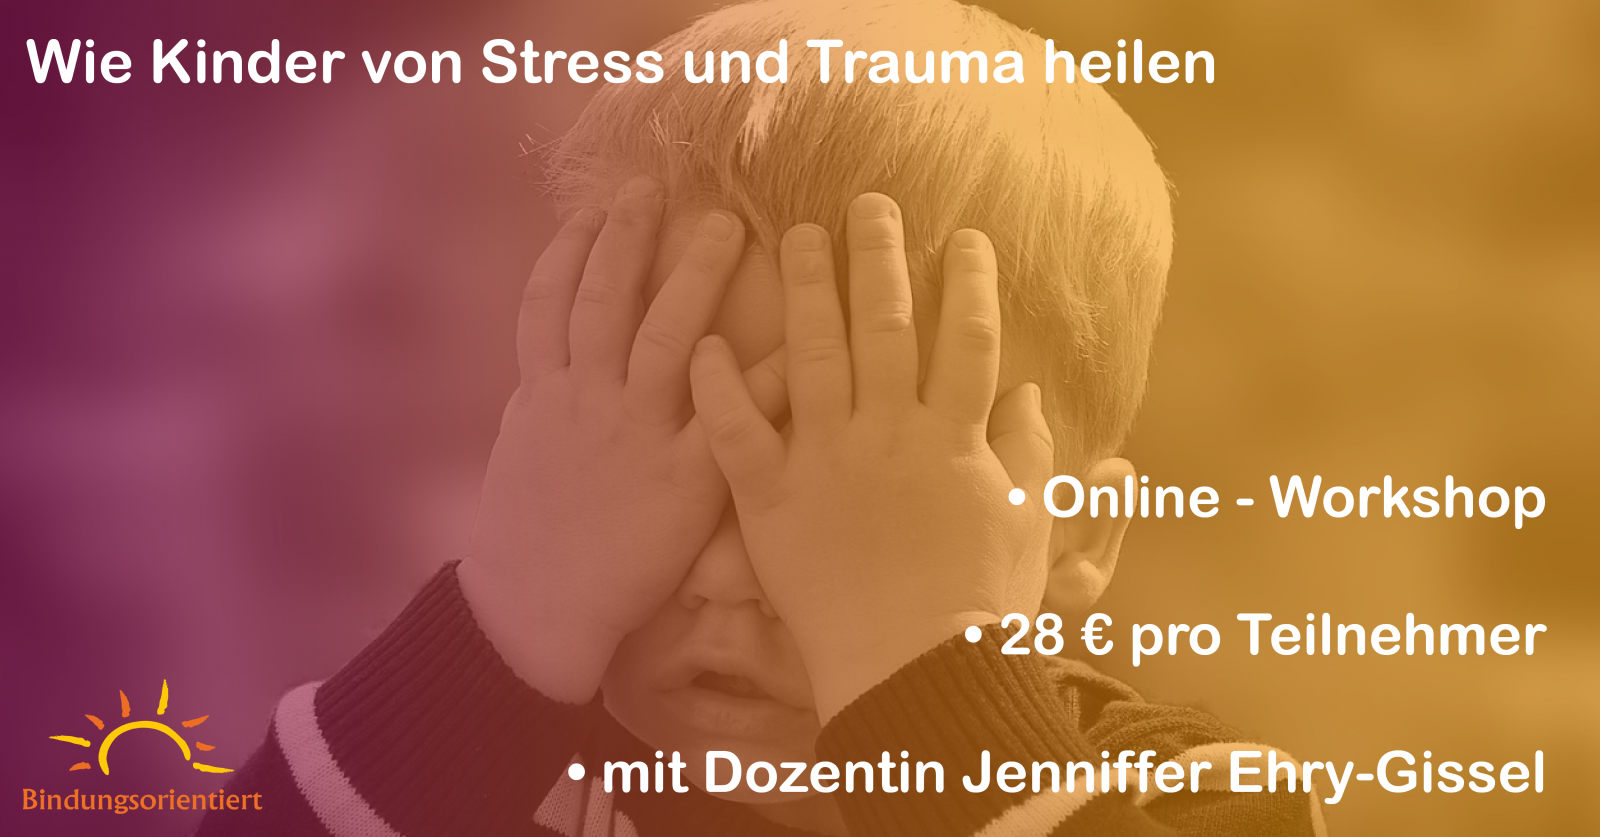 Stress und Trauma